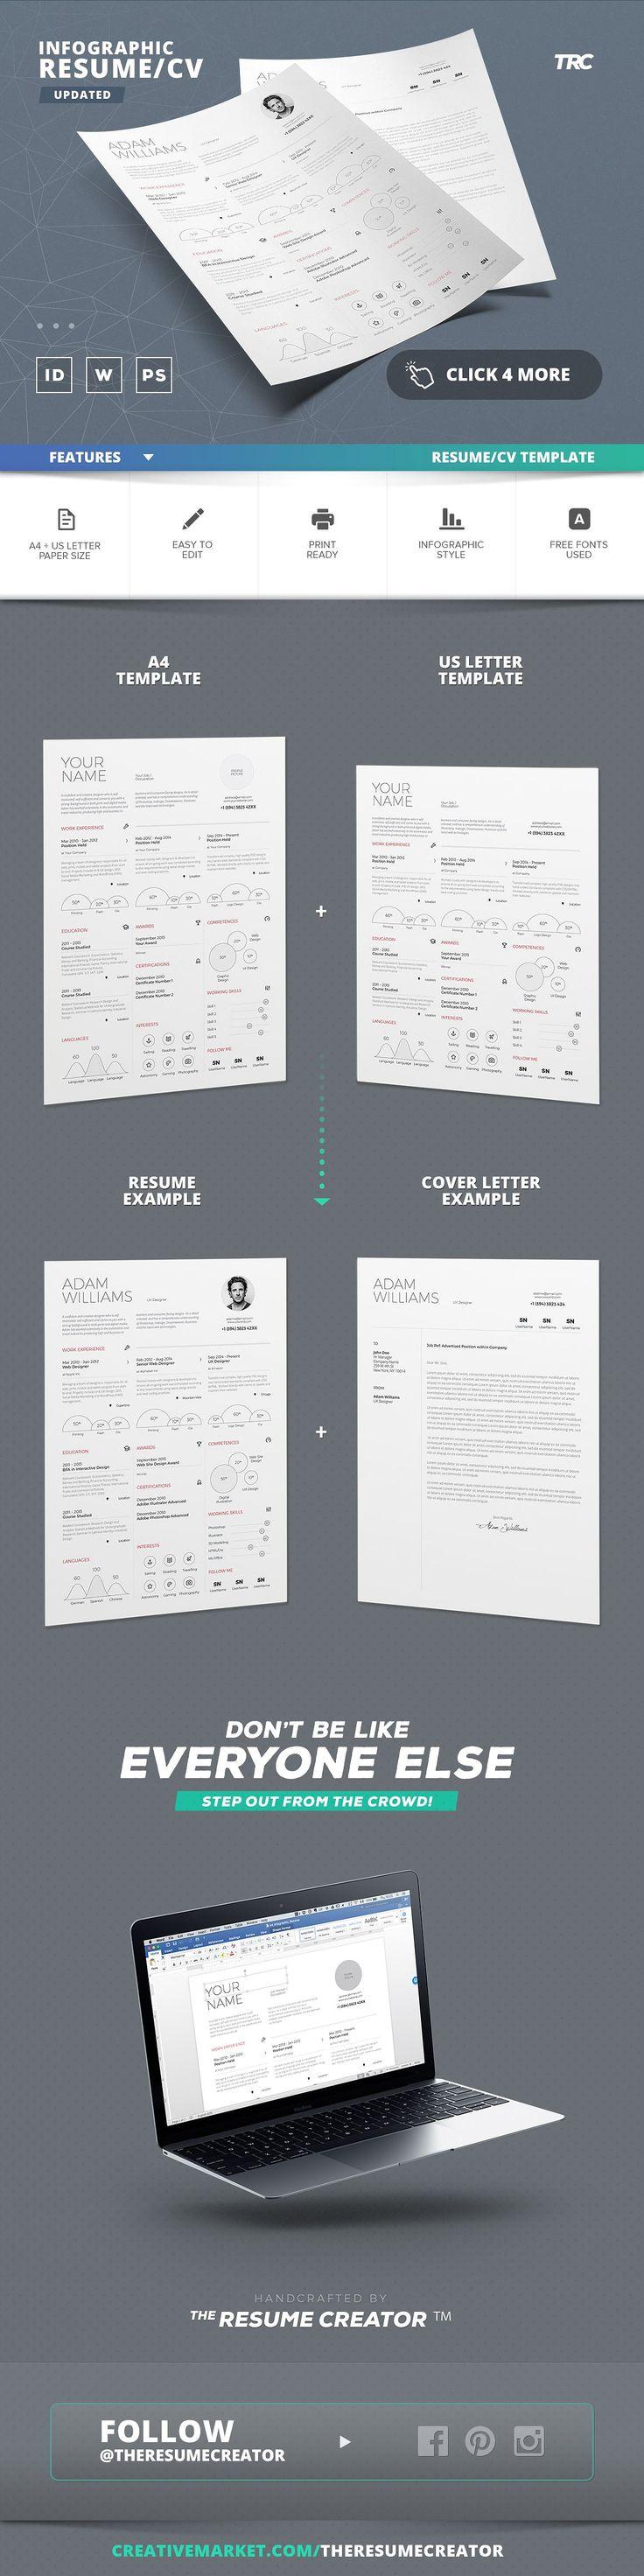 Infographic Resume/Cv Template Vol.4 by TheResumeCreator on @creativemarket @resumecreator